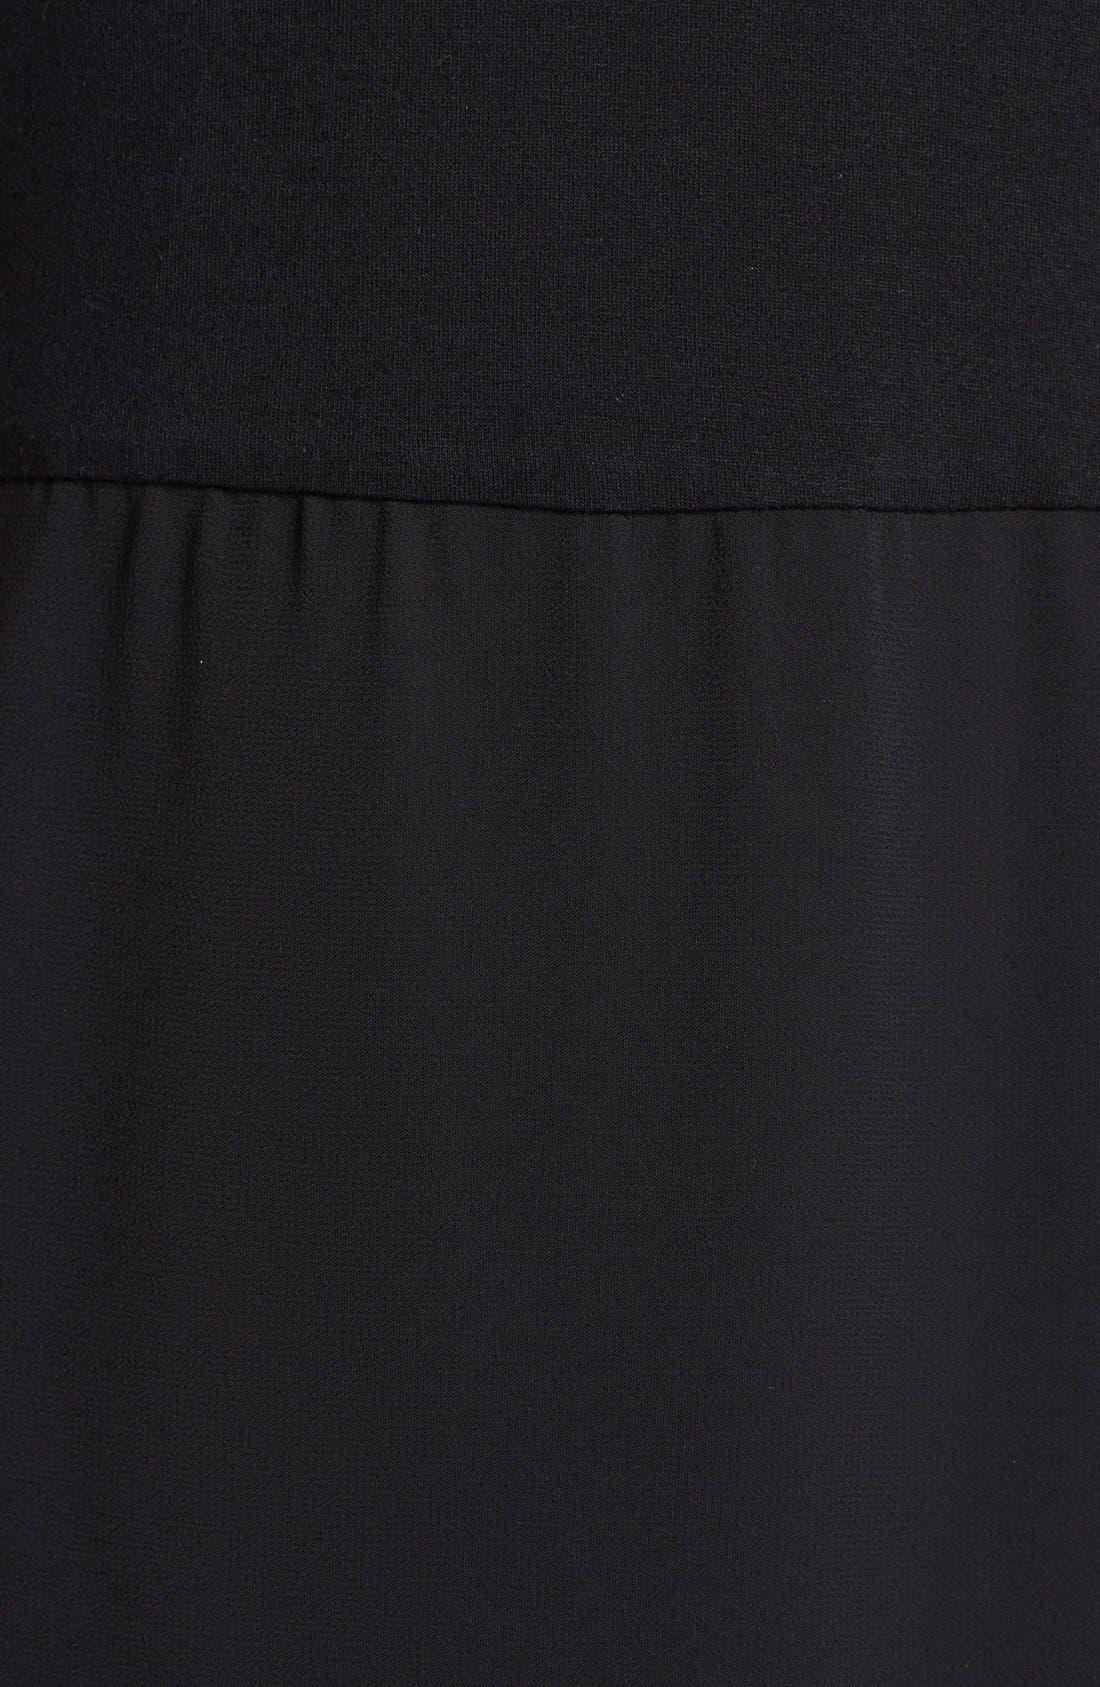 Alternate Image 3  - Vince Camuto Chiffon Overlay Tank Maxi Dress (Petite)